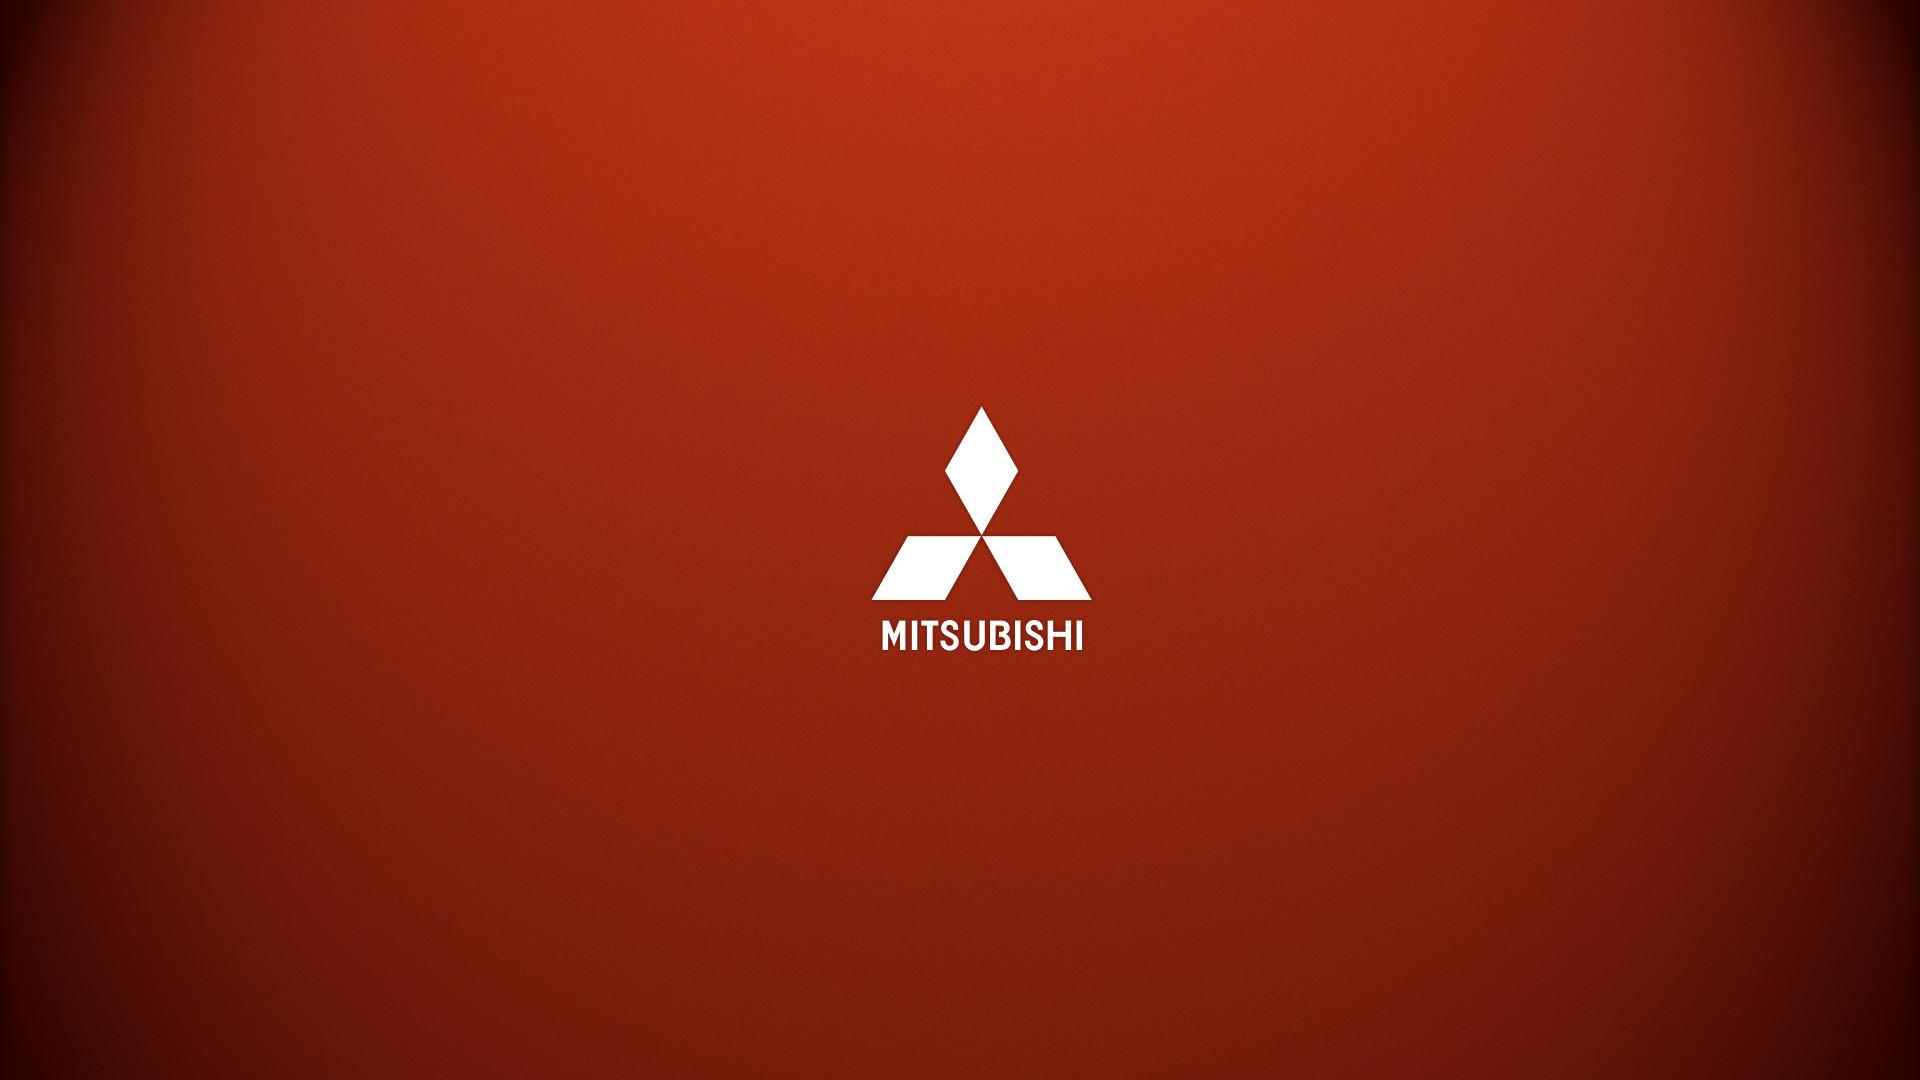 Mitsubishi Logo Wallpaper For Desktop